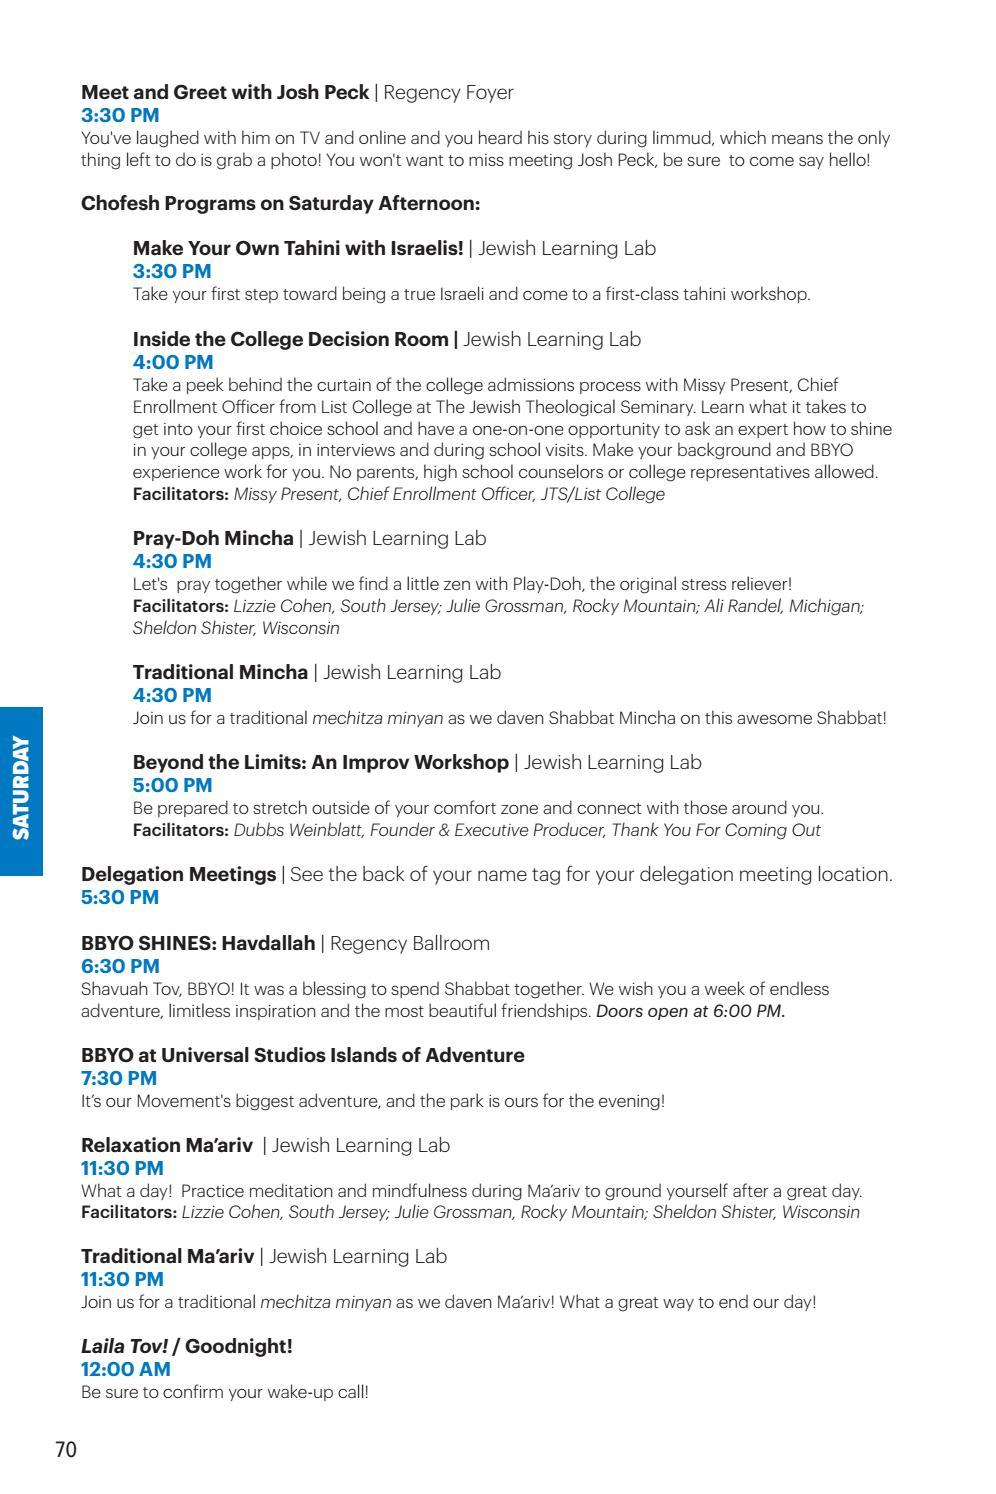 BBYO International Convention 2018 Program Guide by BBYO - issuu